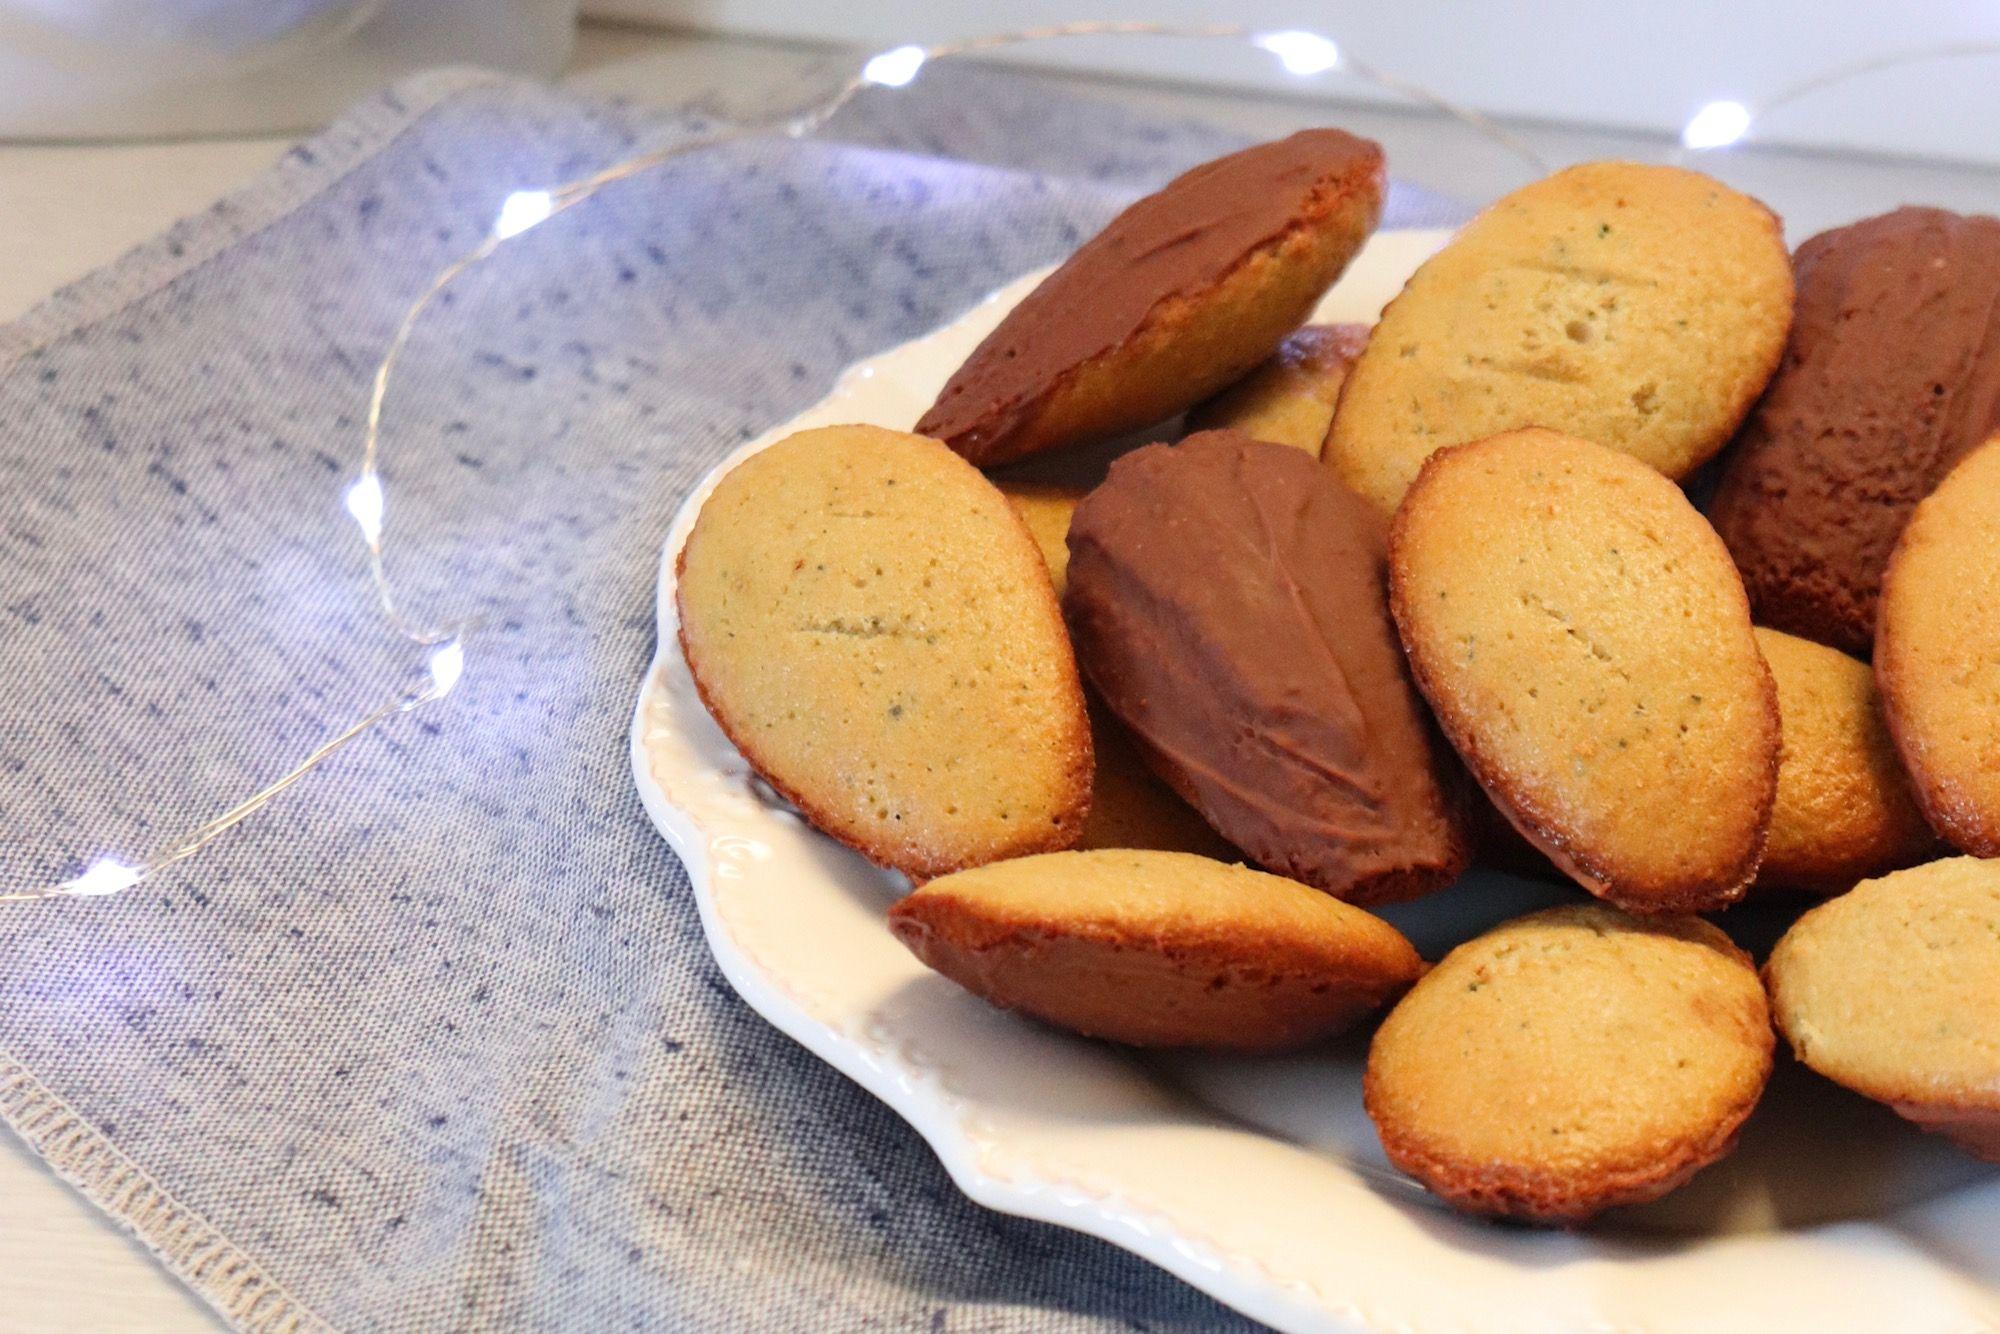 madeleines thé matcha vanille recette patisserie léa patisseries inspirées